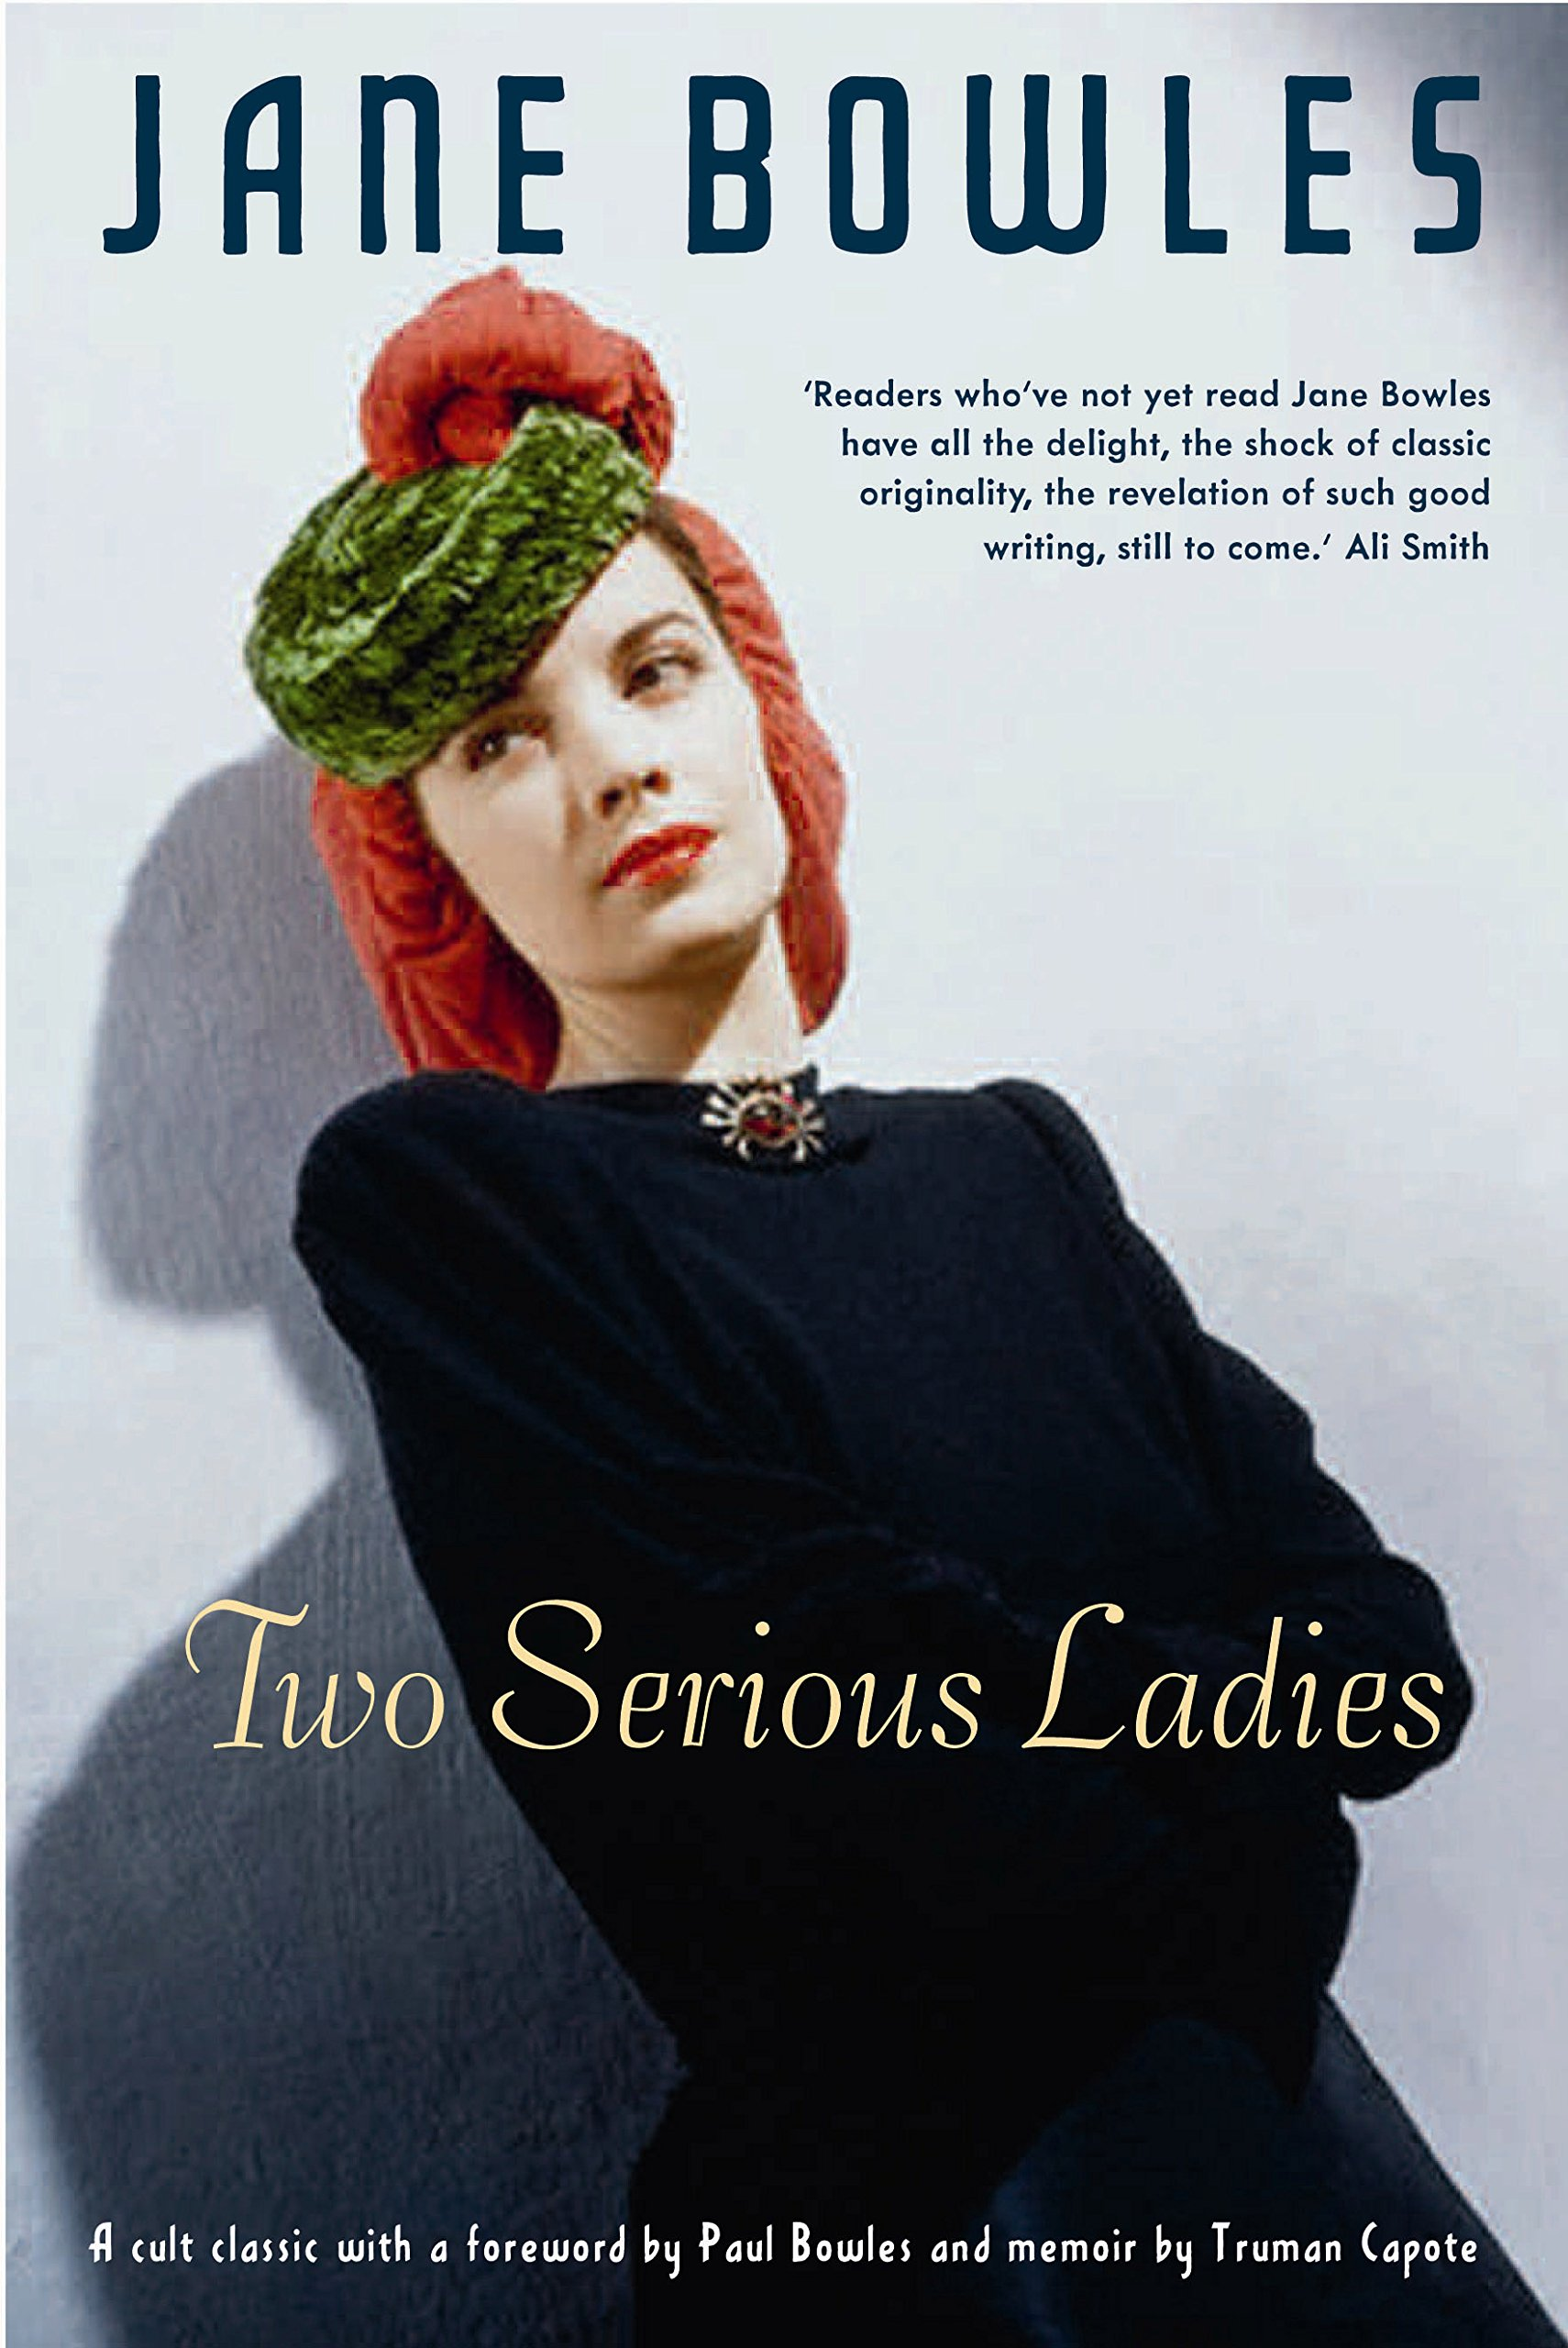 Jane Bowles-Two-Serious-Ladies-Sort-of-Books.jpg